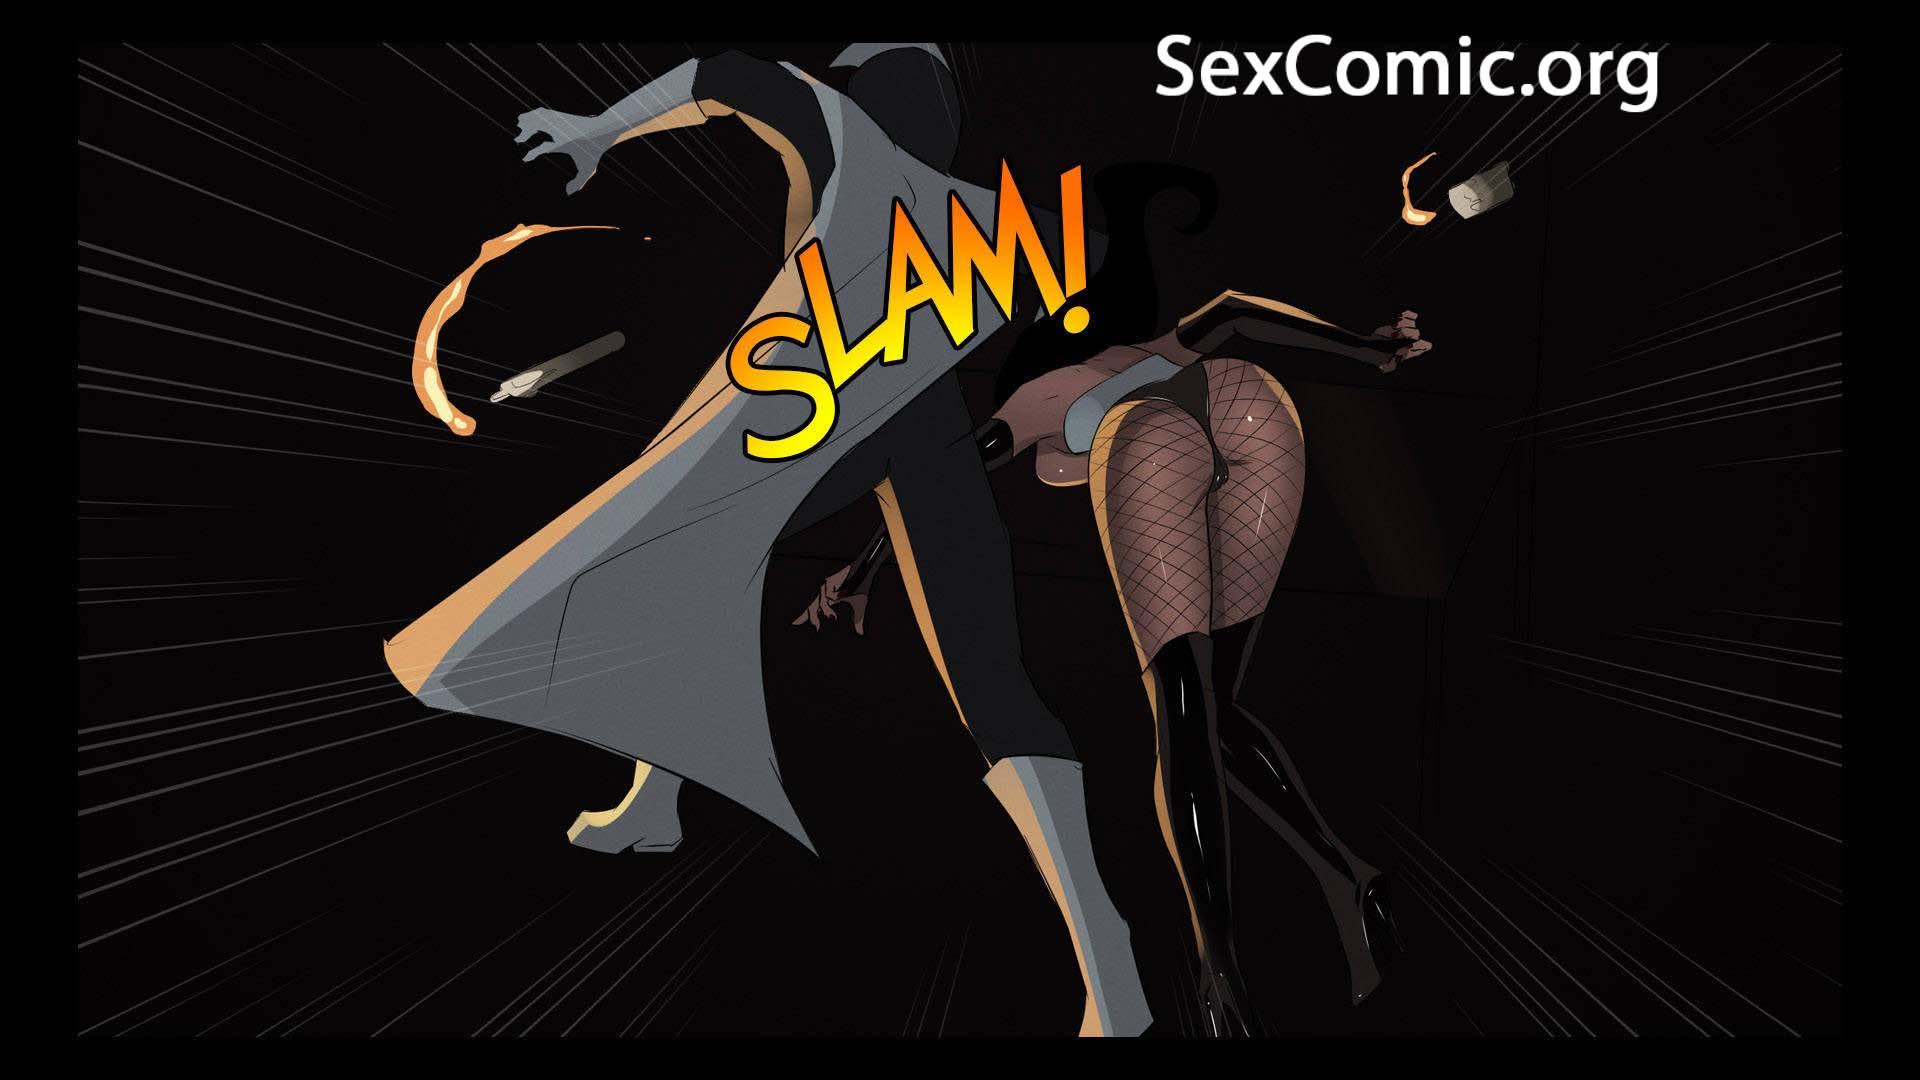 comics-marvel-xxx-vengandose-de-zatana-mangas-para-adultos-fantasias-sexuales-hentai-videos-porno-gratis-comics-de-zoofilia-comics-incesto-6